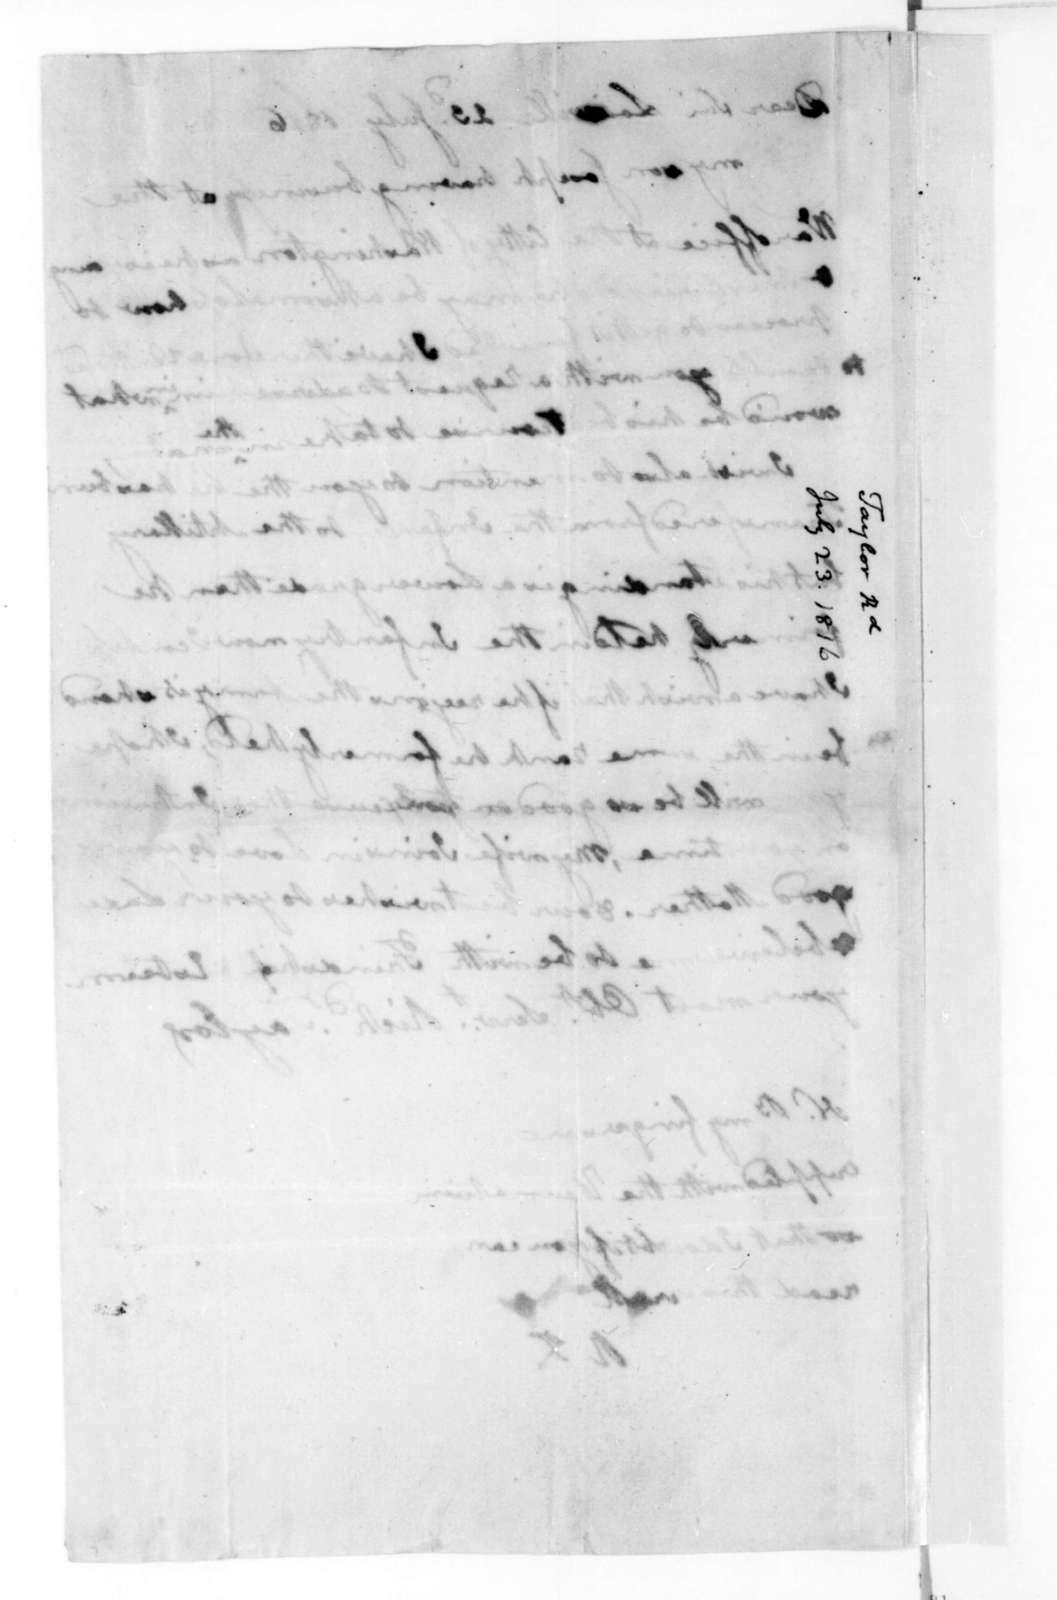 Richard Taylor to James Madison, July 23, 1816.